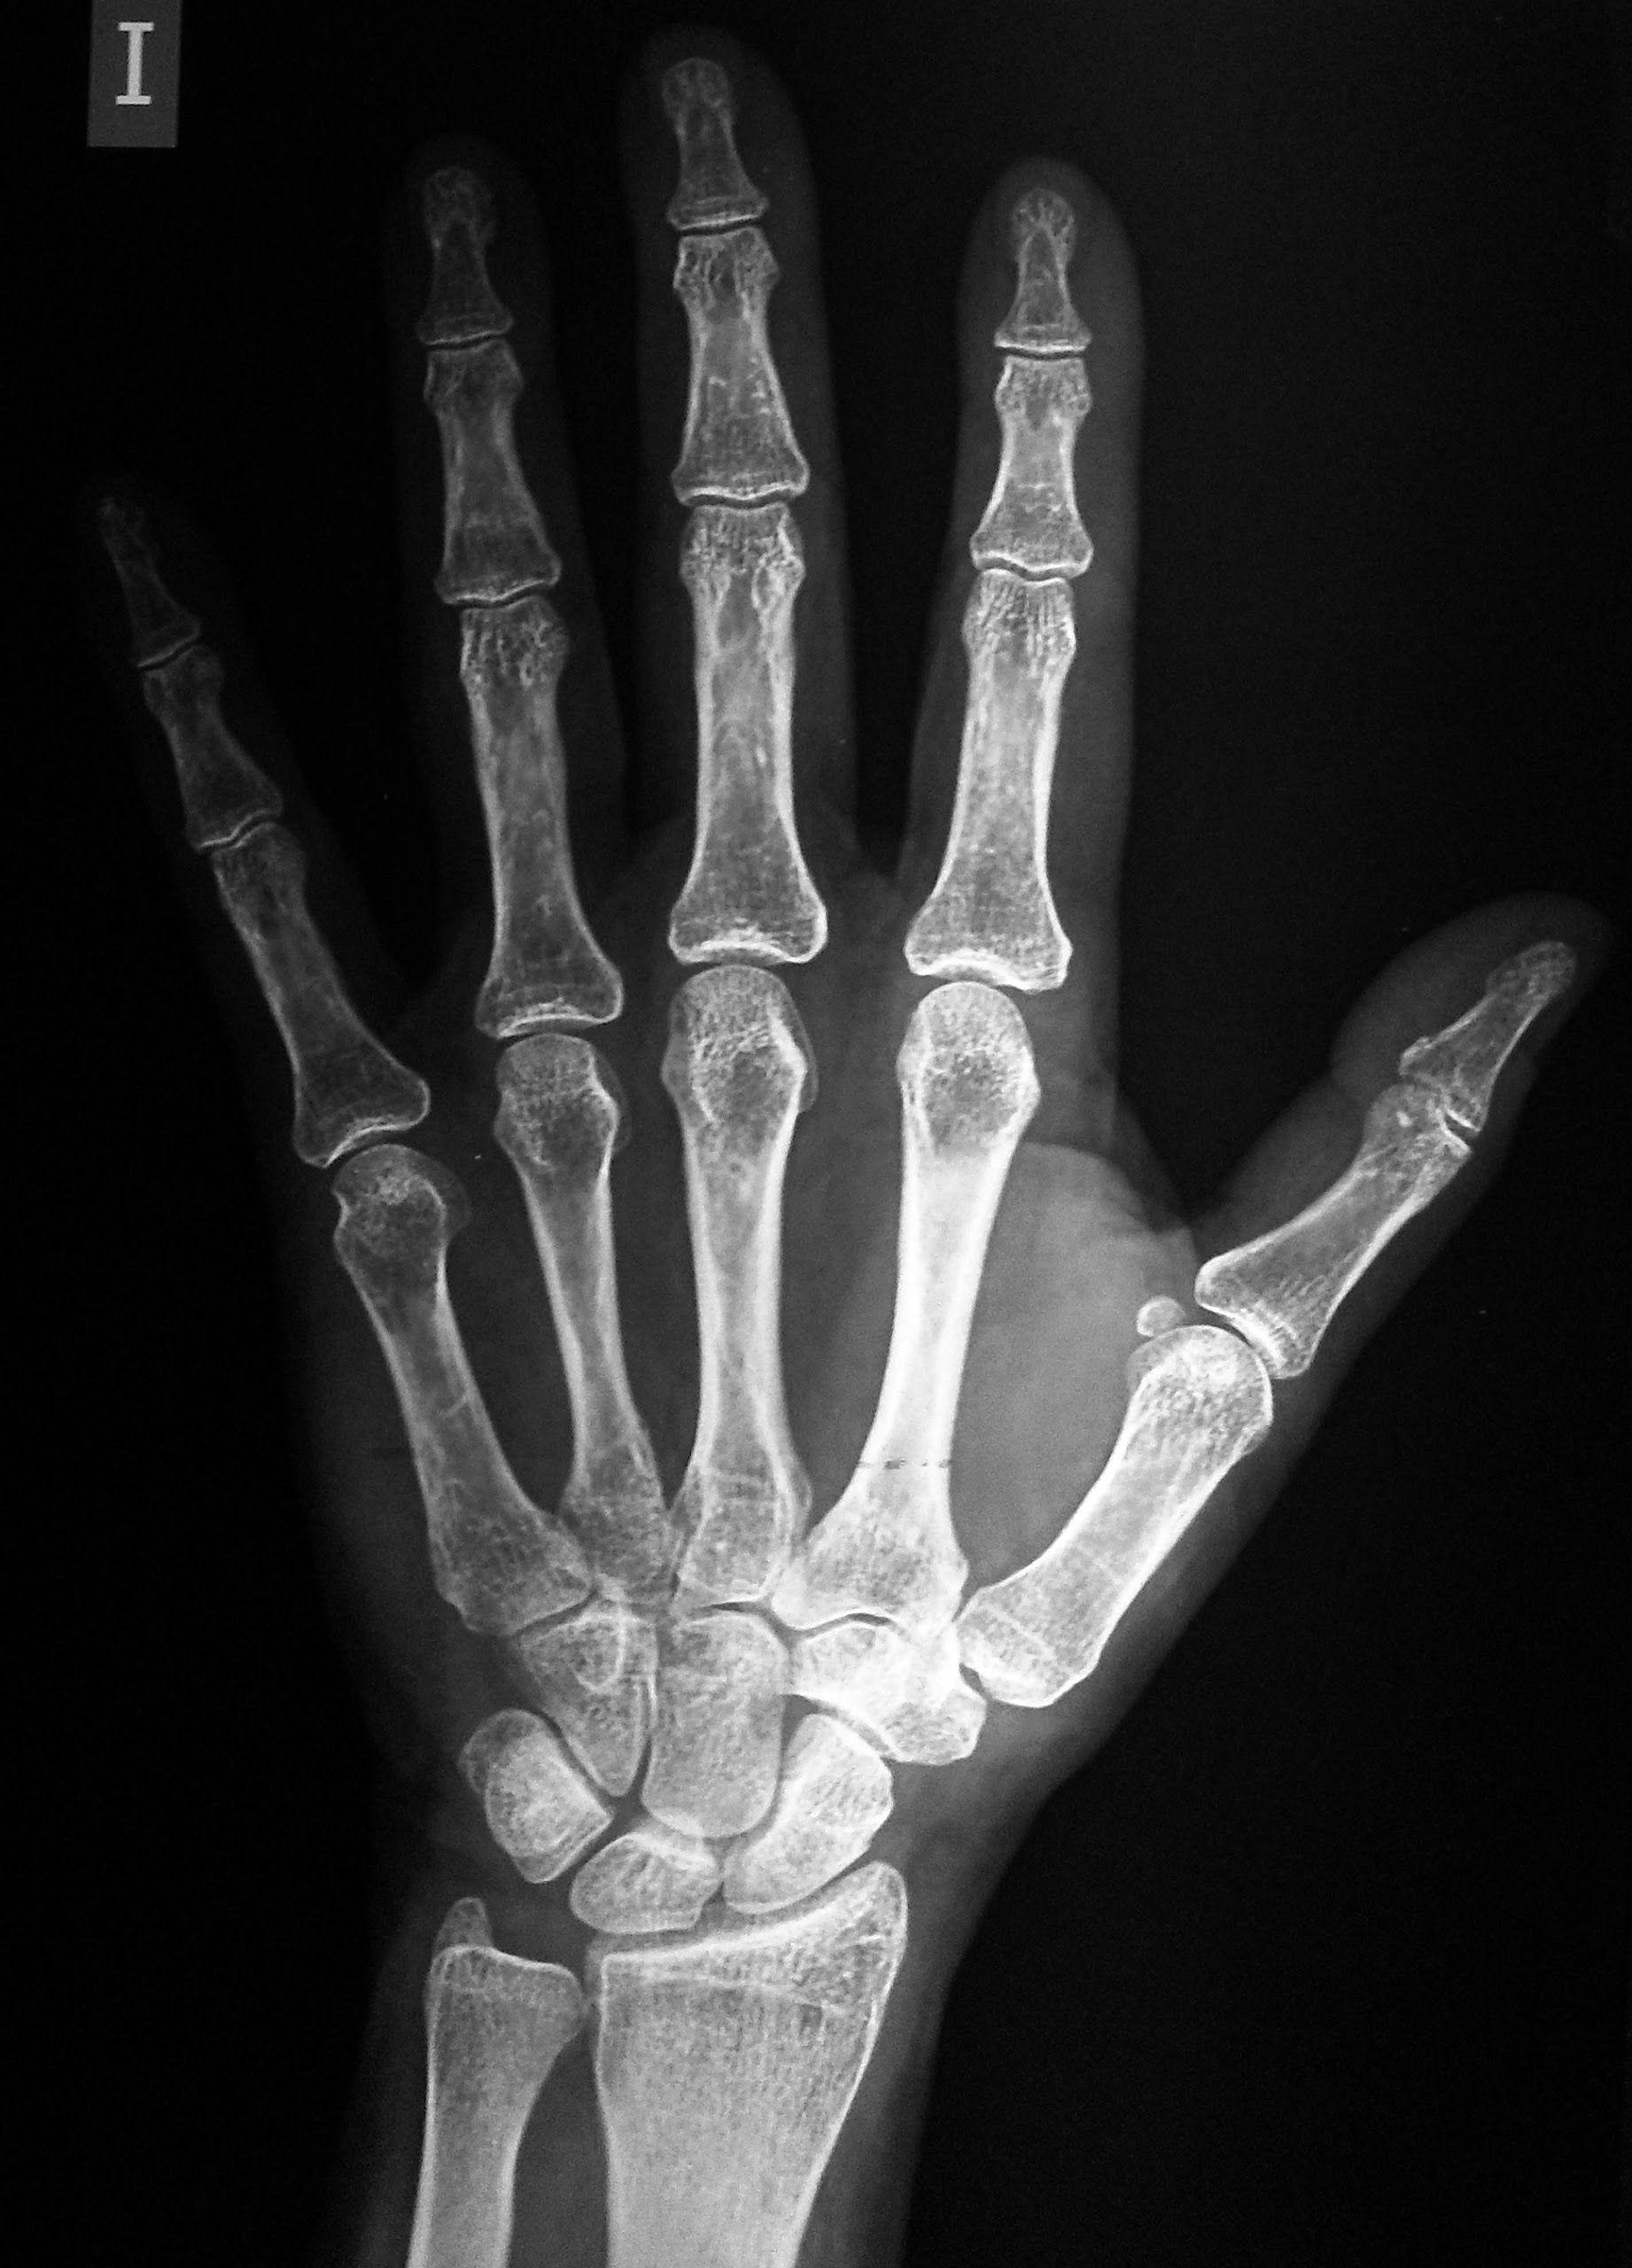 Sdc16181 Jpg Tatuaje Buho Radiografia Manos